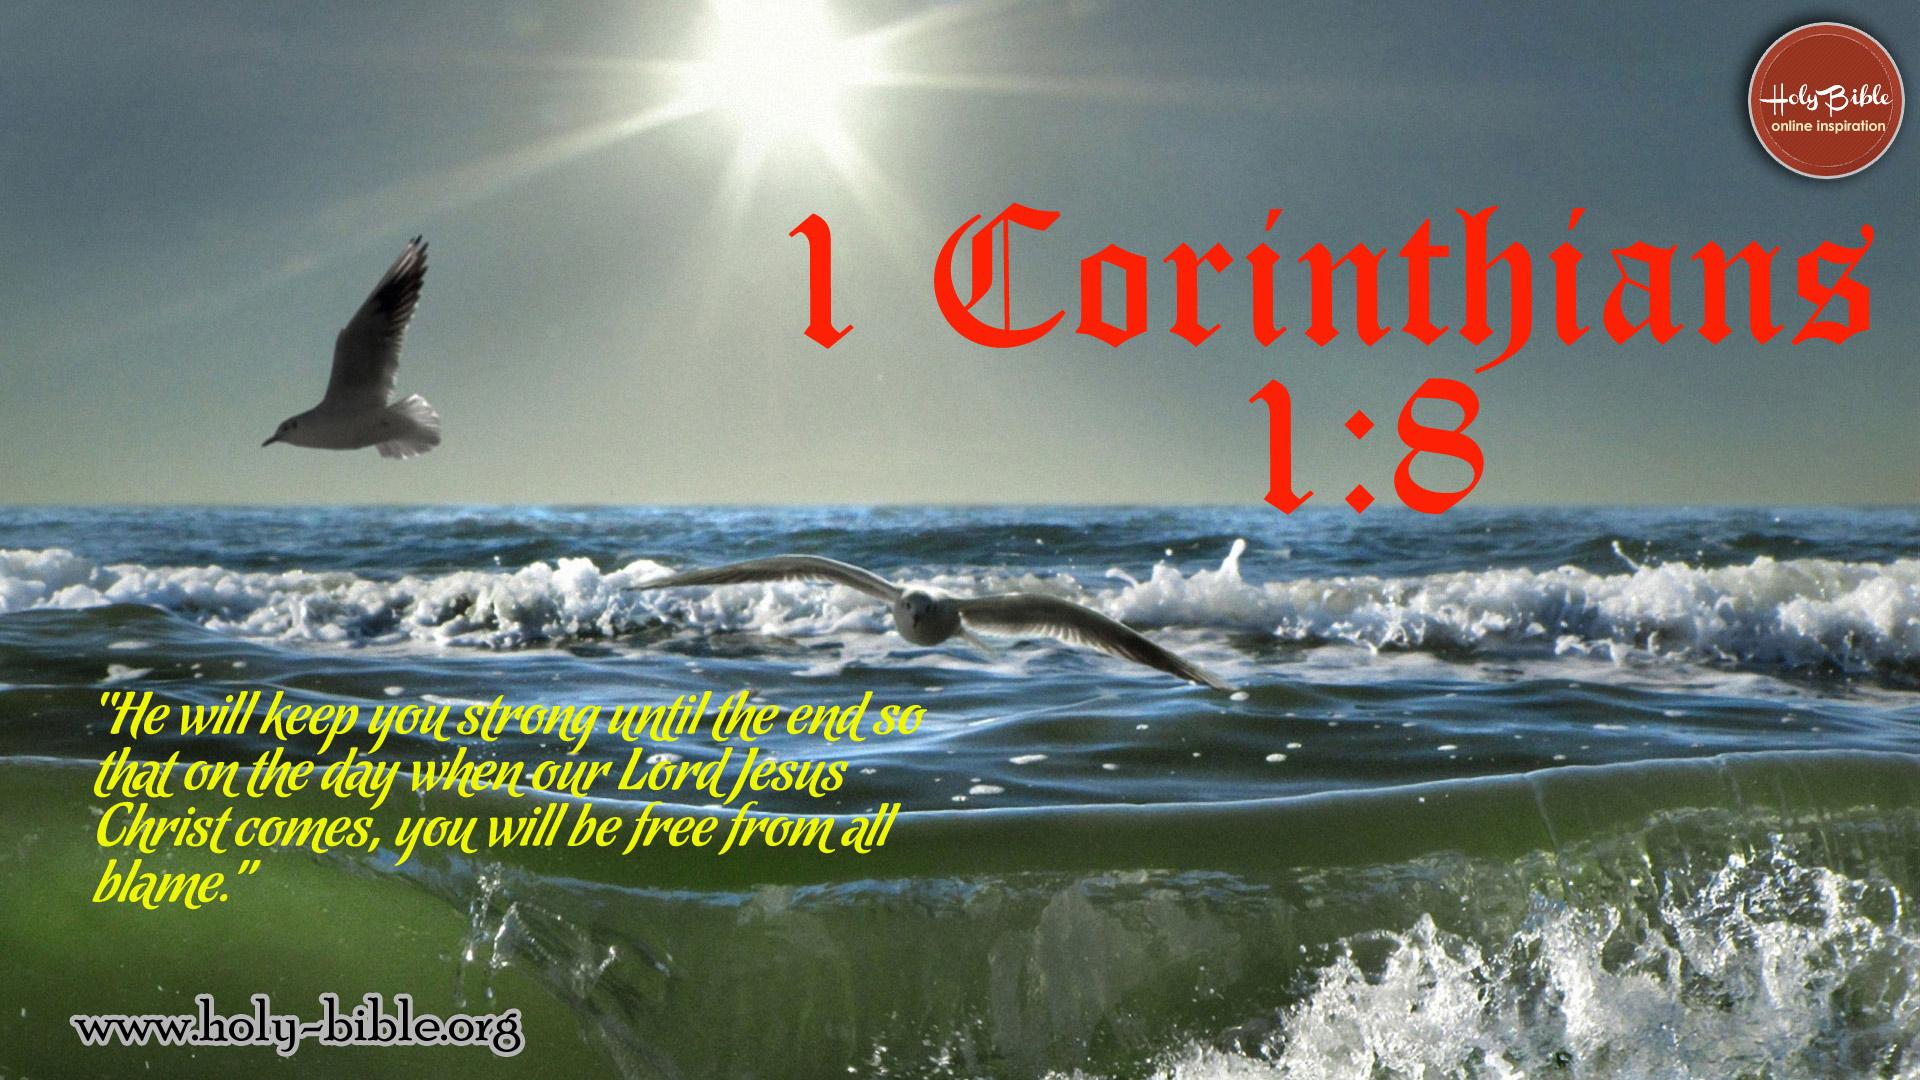 Bible Verse of the day - 1 Corinthians 1:8